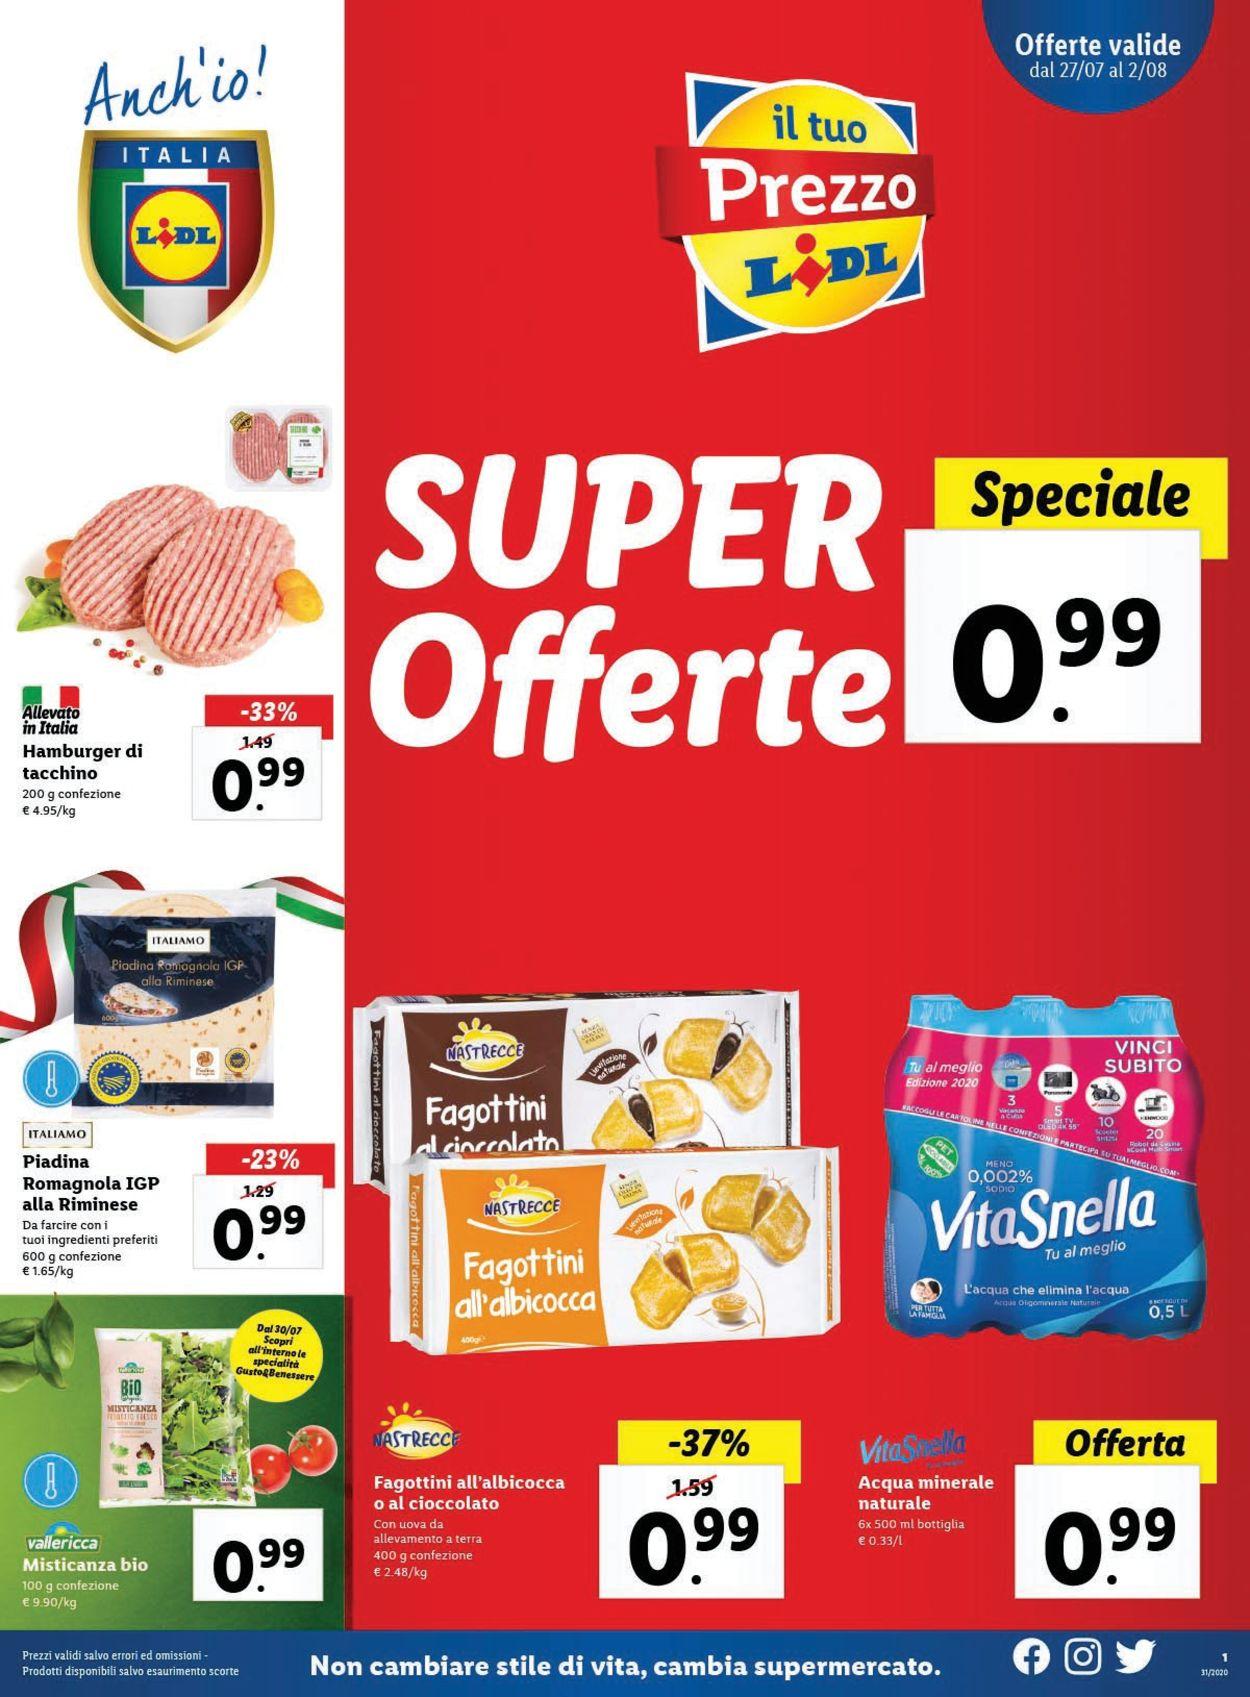 Volantino Lidl - Offerte 27/07-02/08/2020